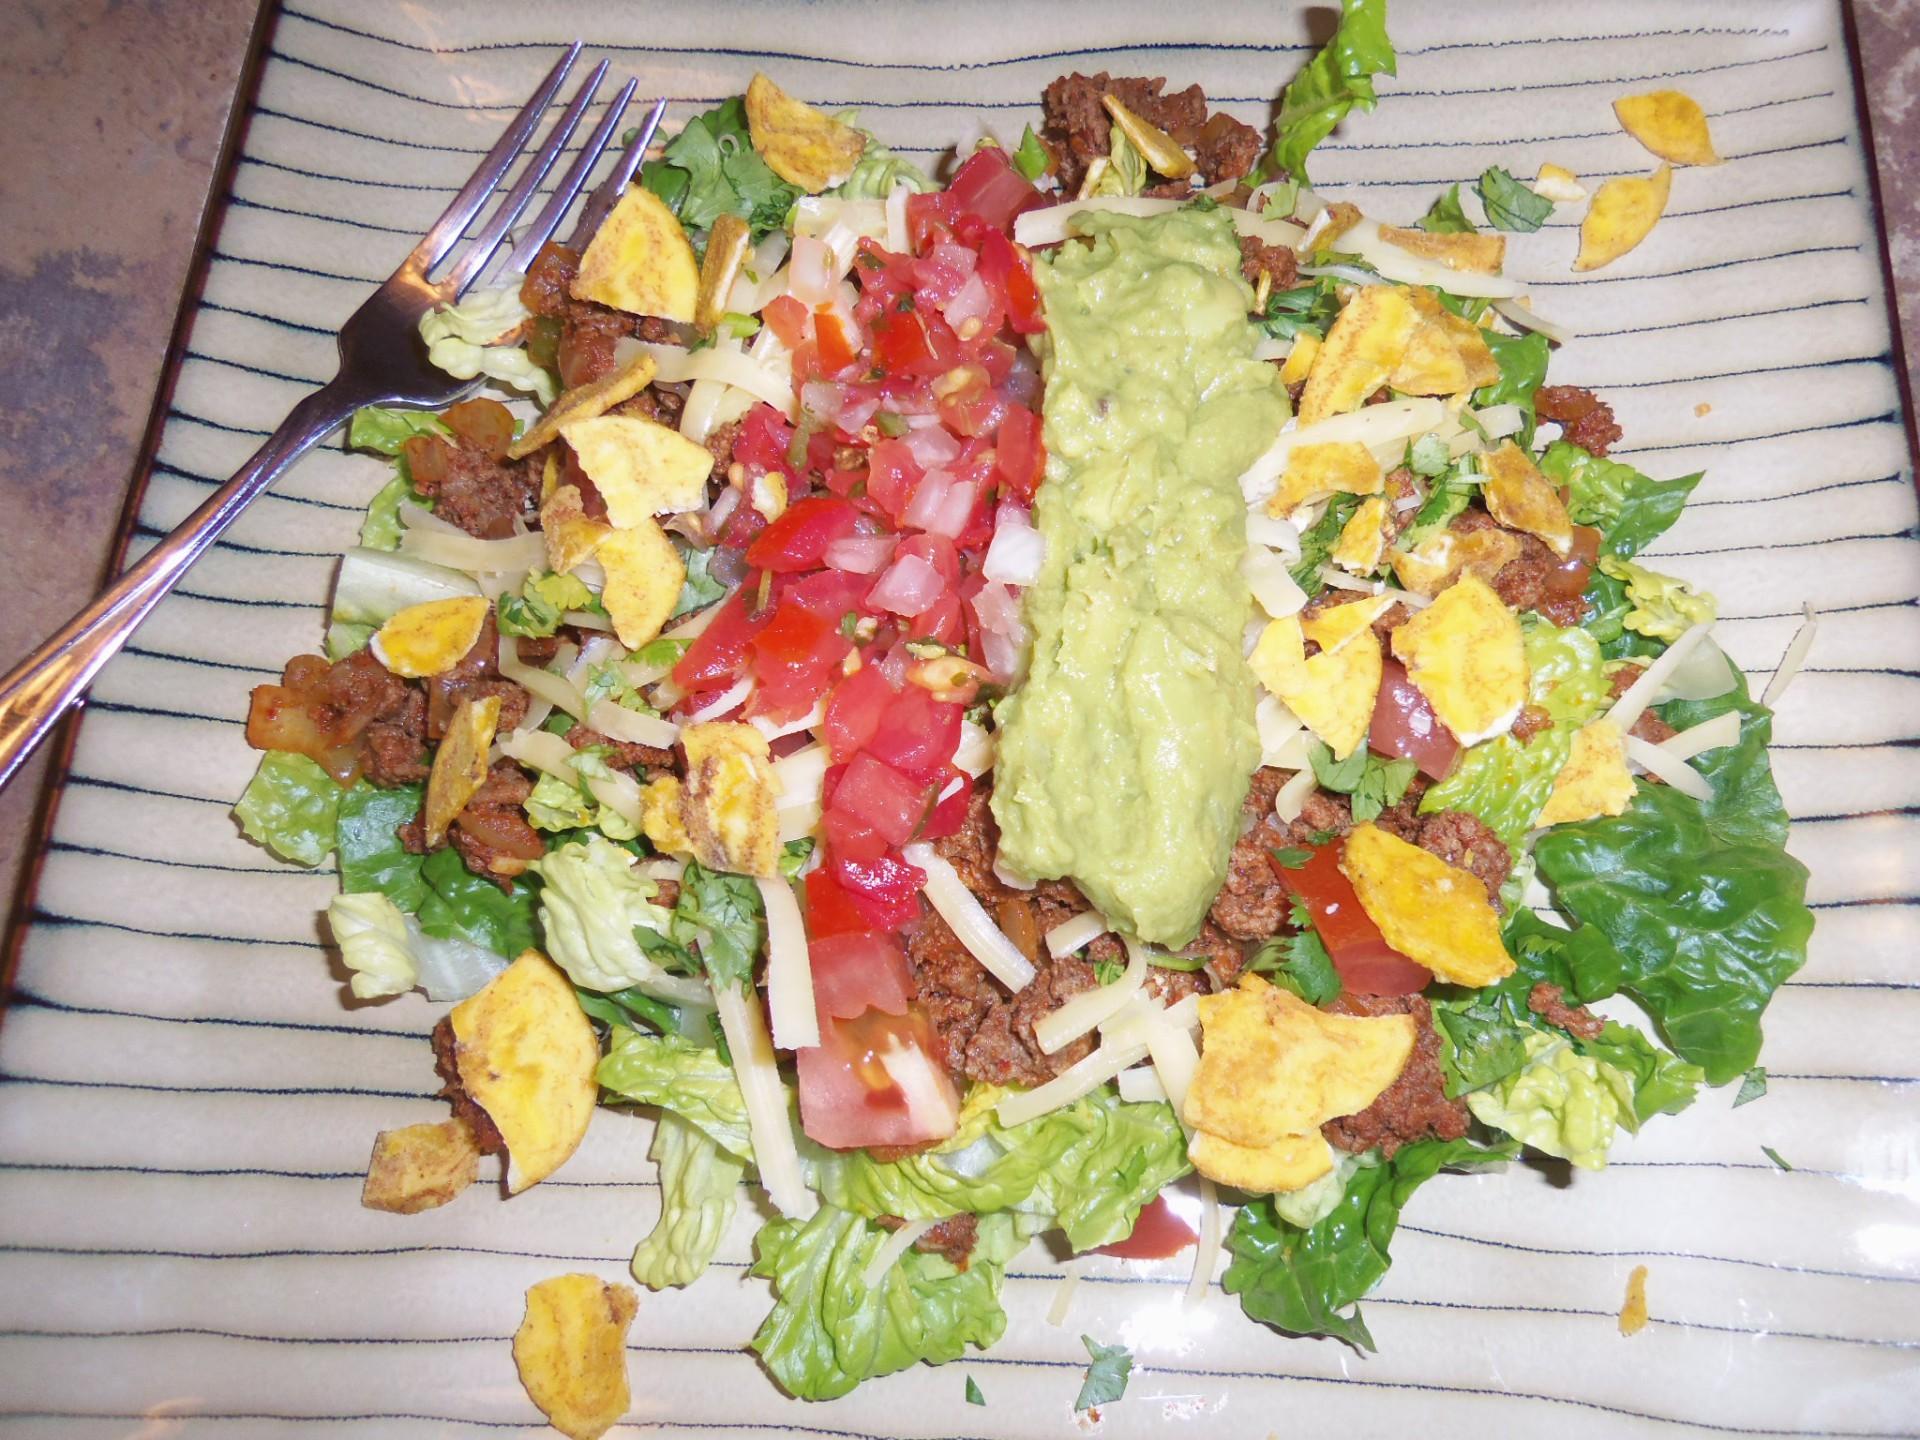 New Recipe: Taco Salad